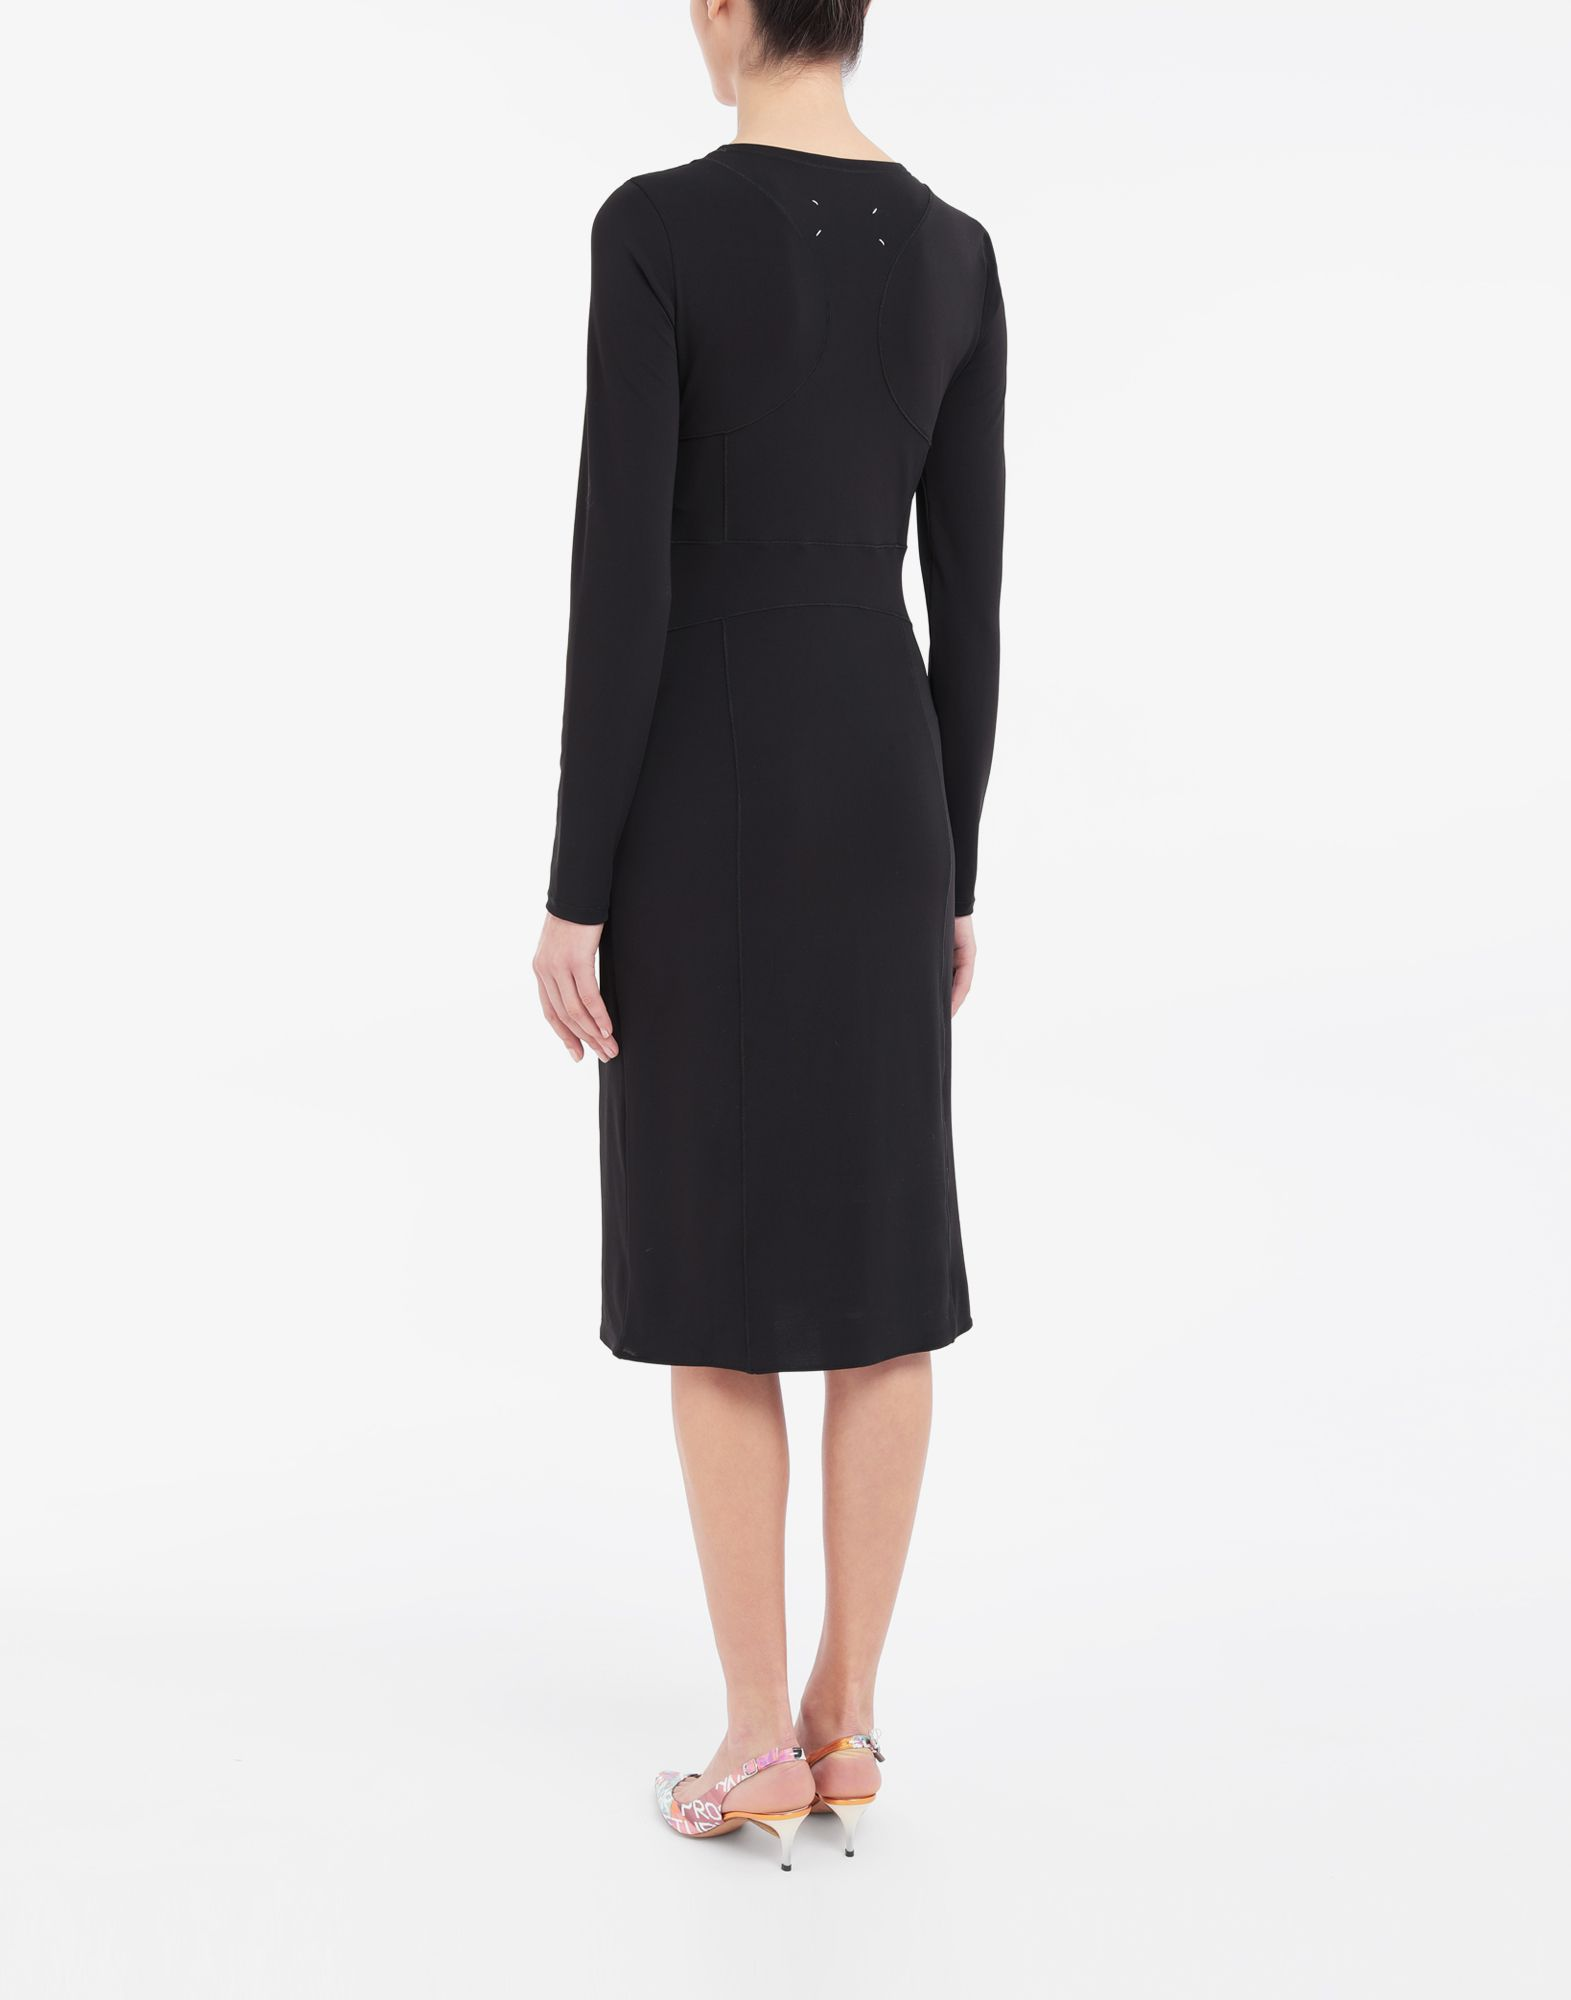 MAISON MARGIELA Stitch-jacquard jersey knit dress 3/4 length dress Woman e